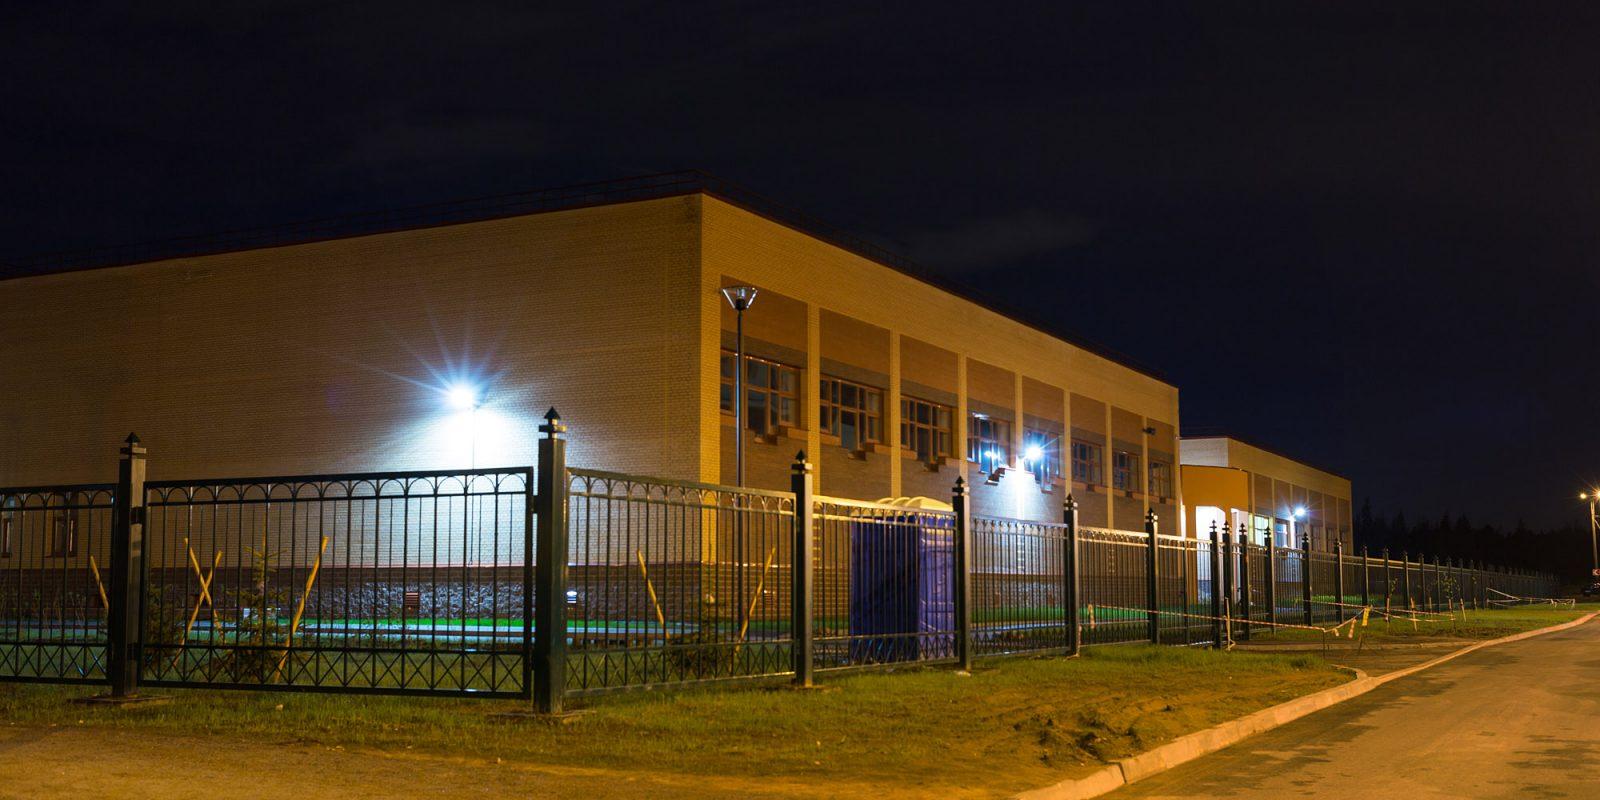 Школа №428 (Юнтолово)